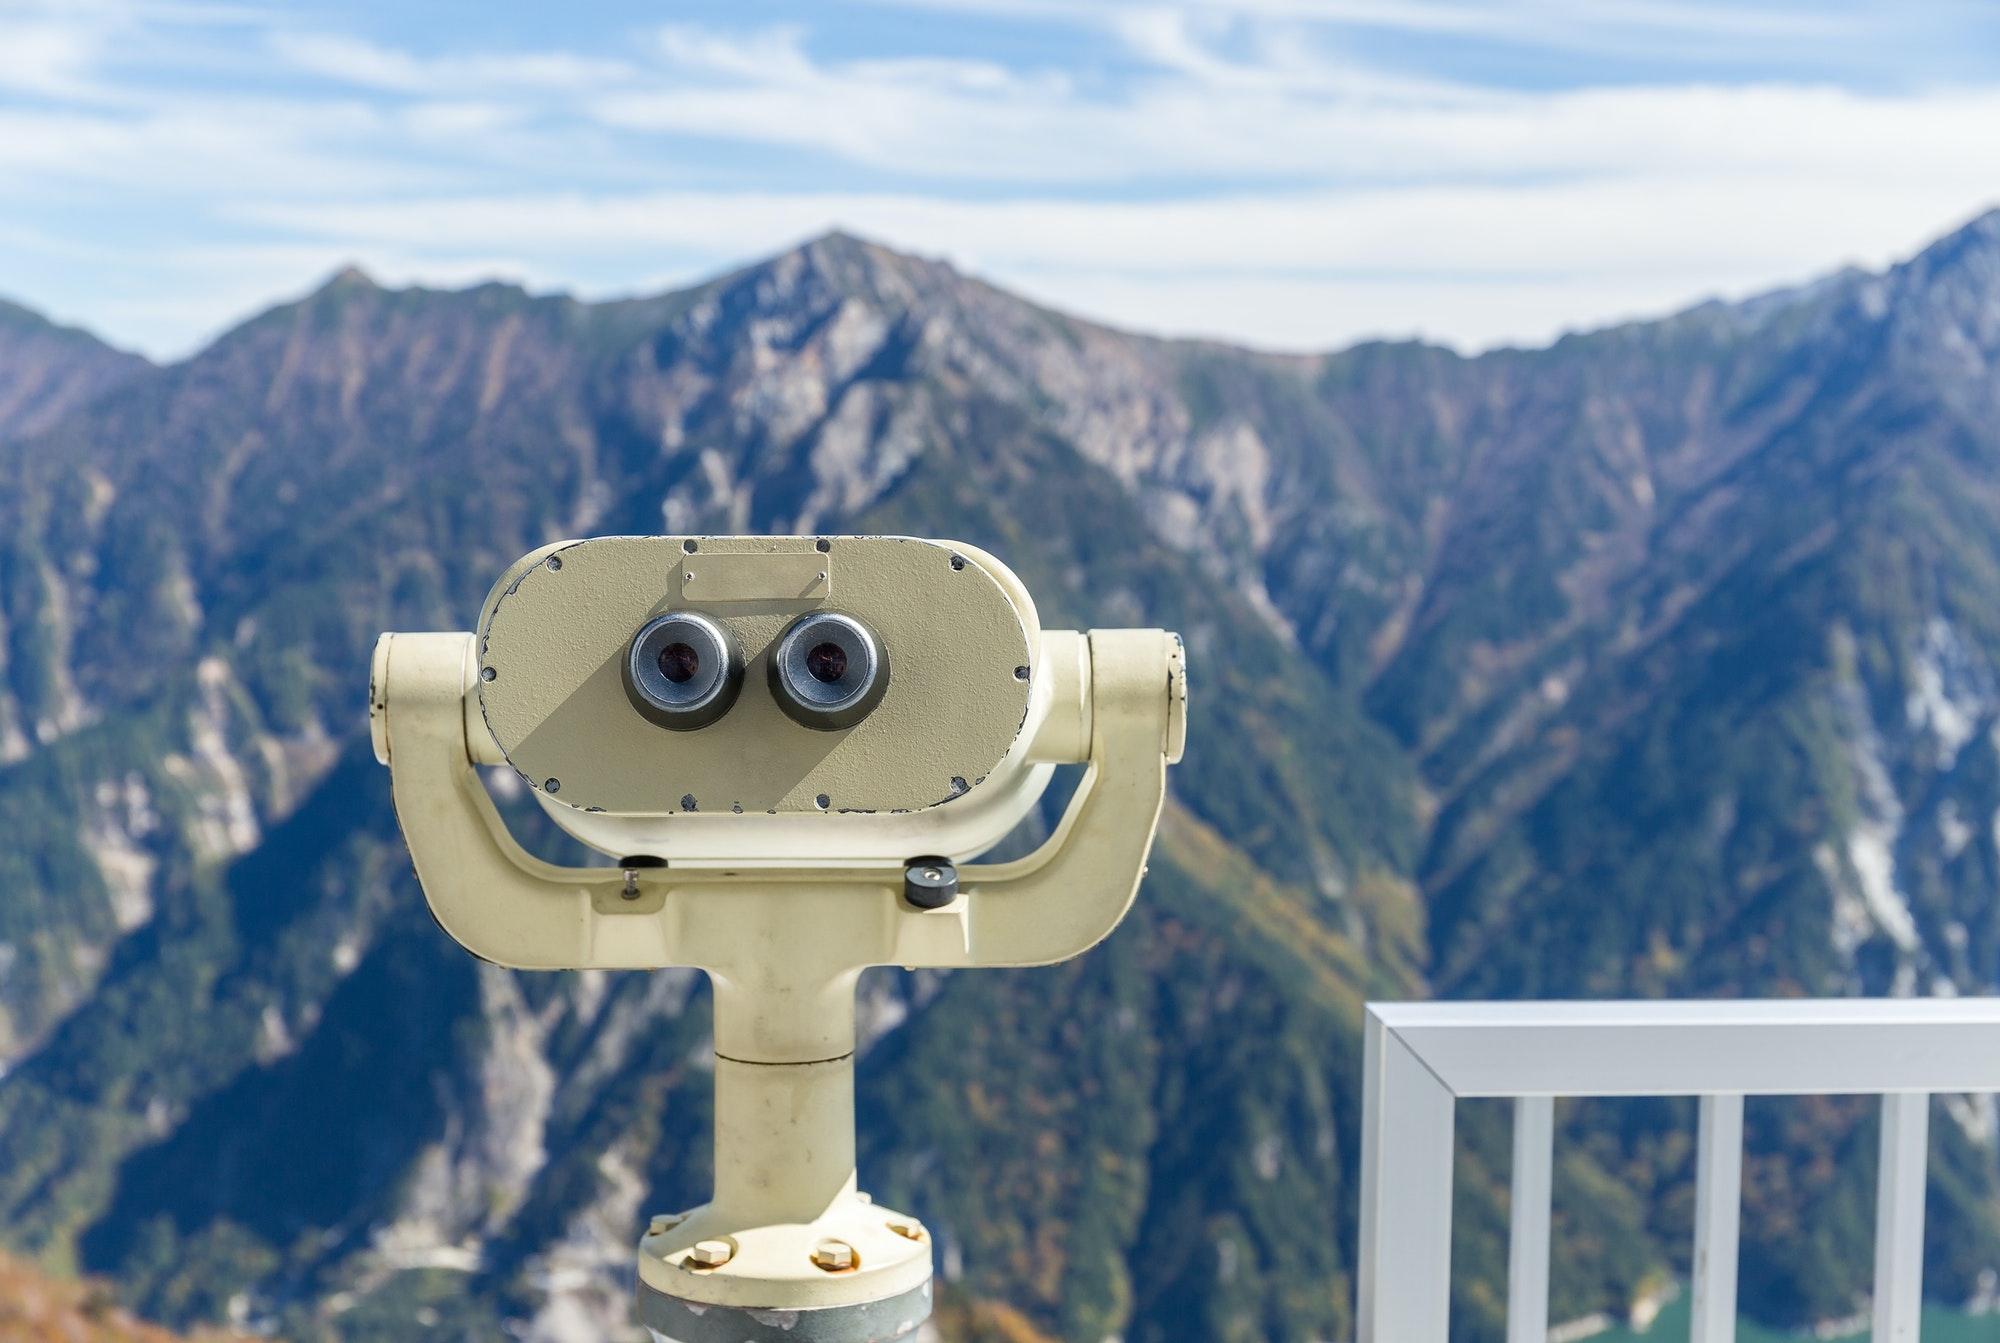 Tourist binocular at mountain